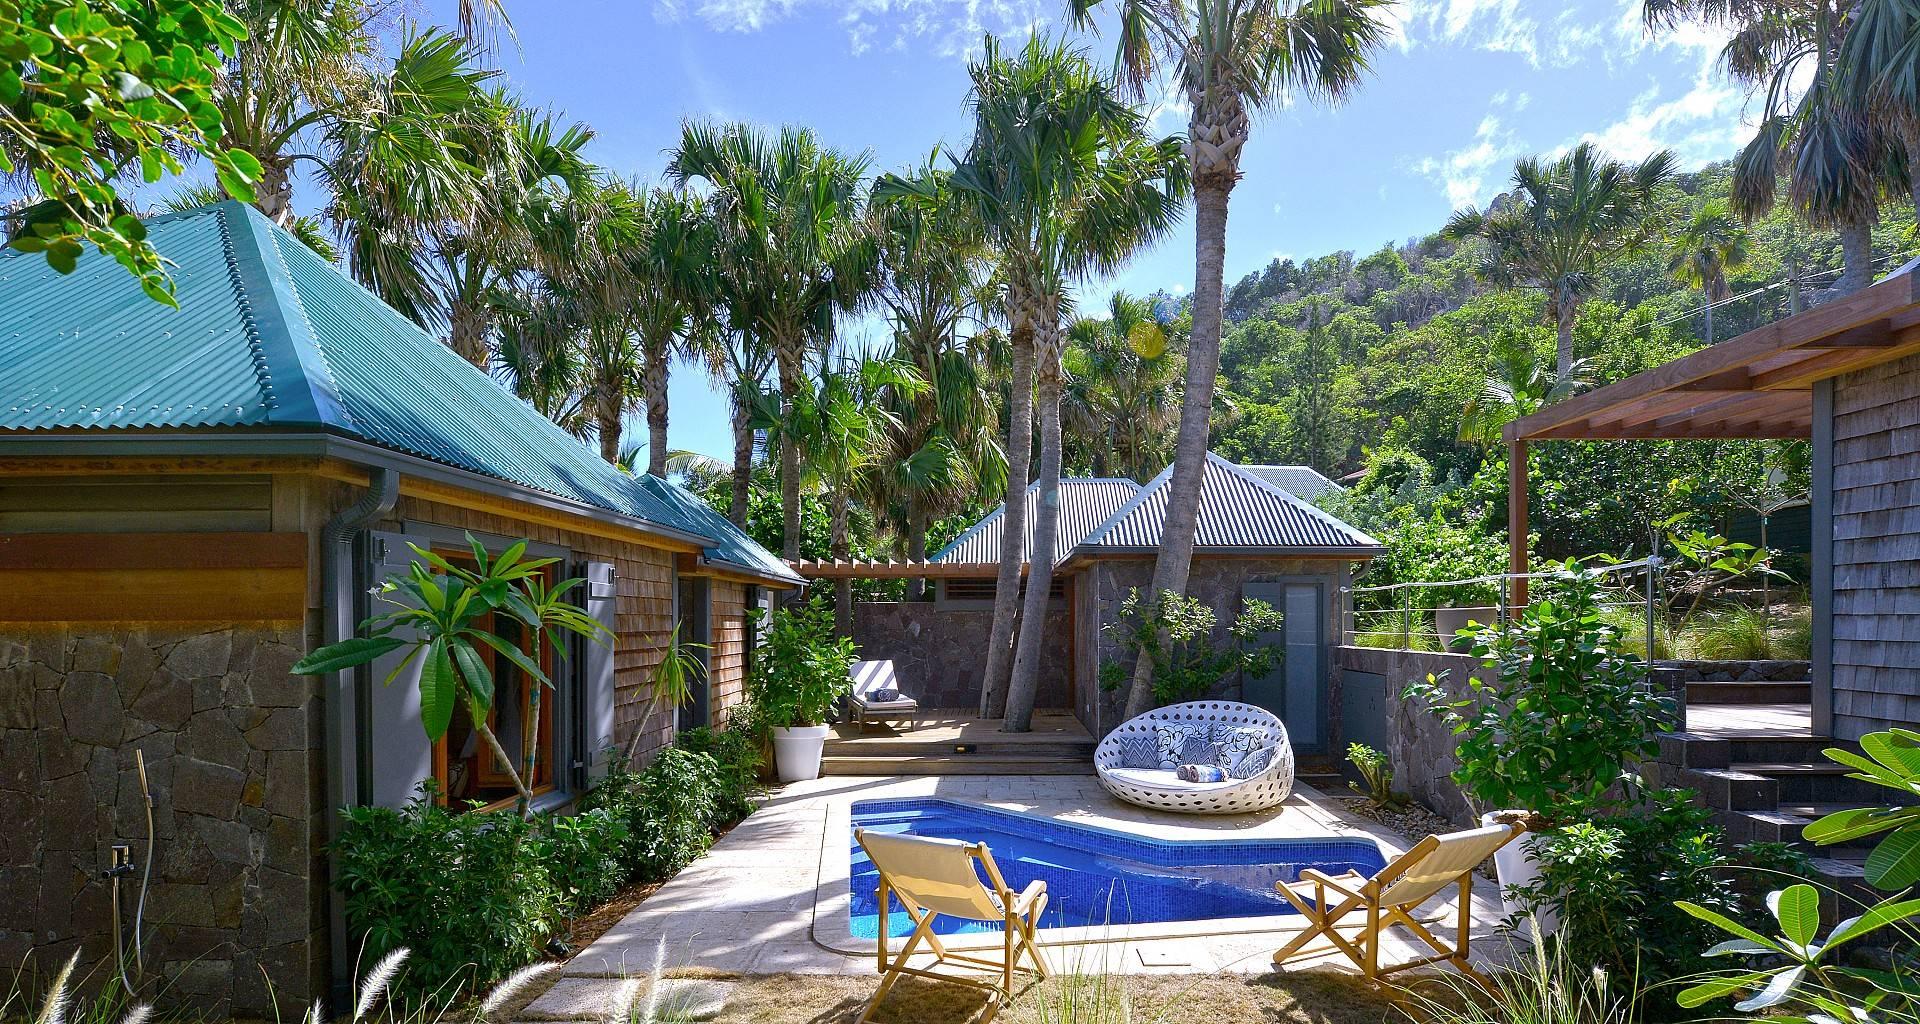 Villa Palm House is a sweet 2-bedroom villa on St. Barts.